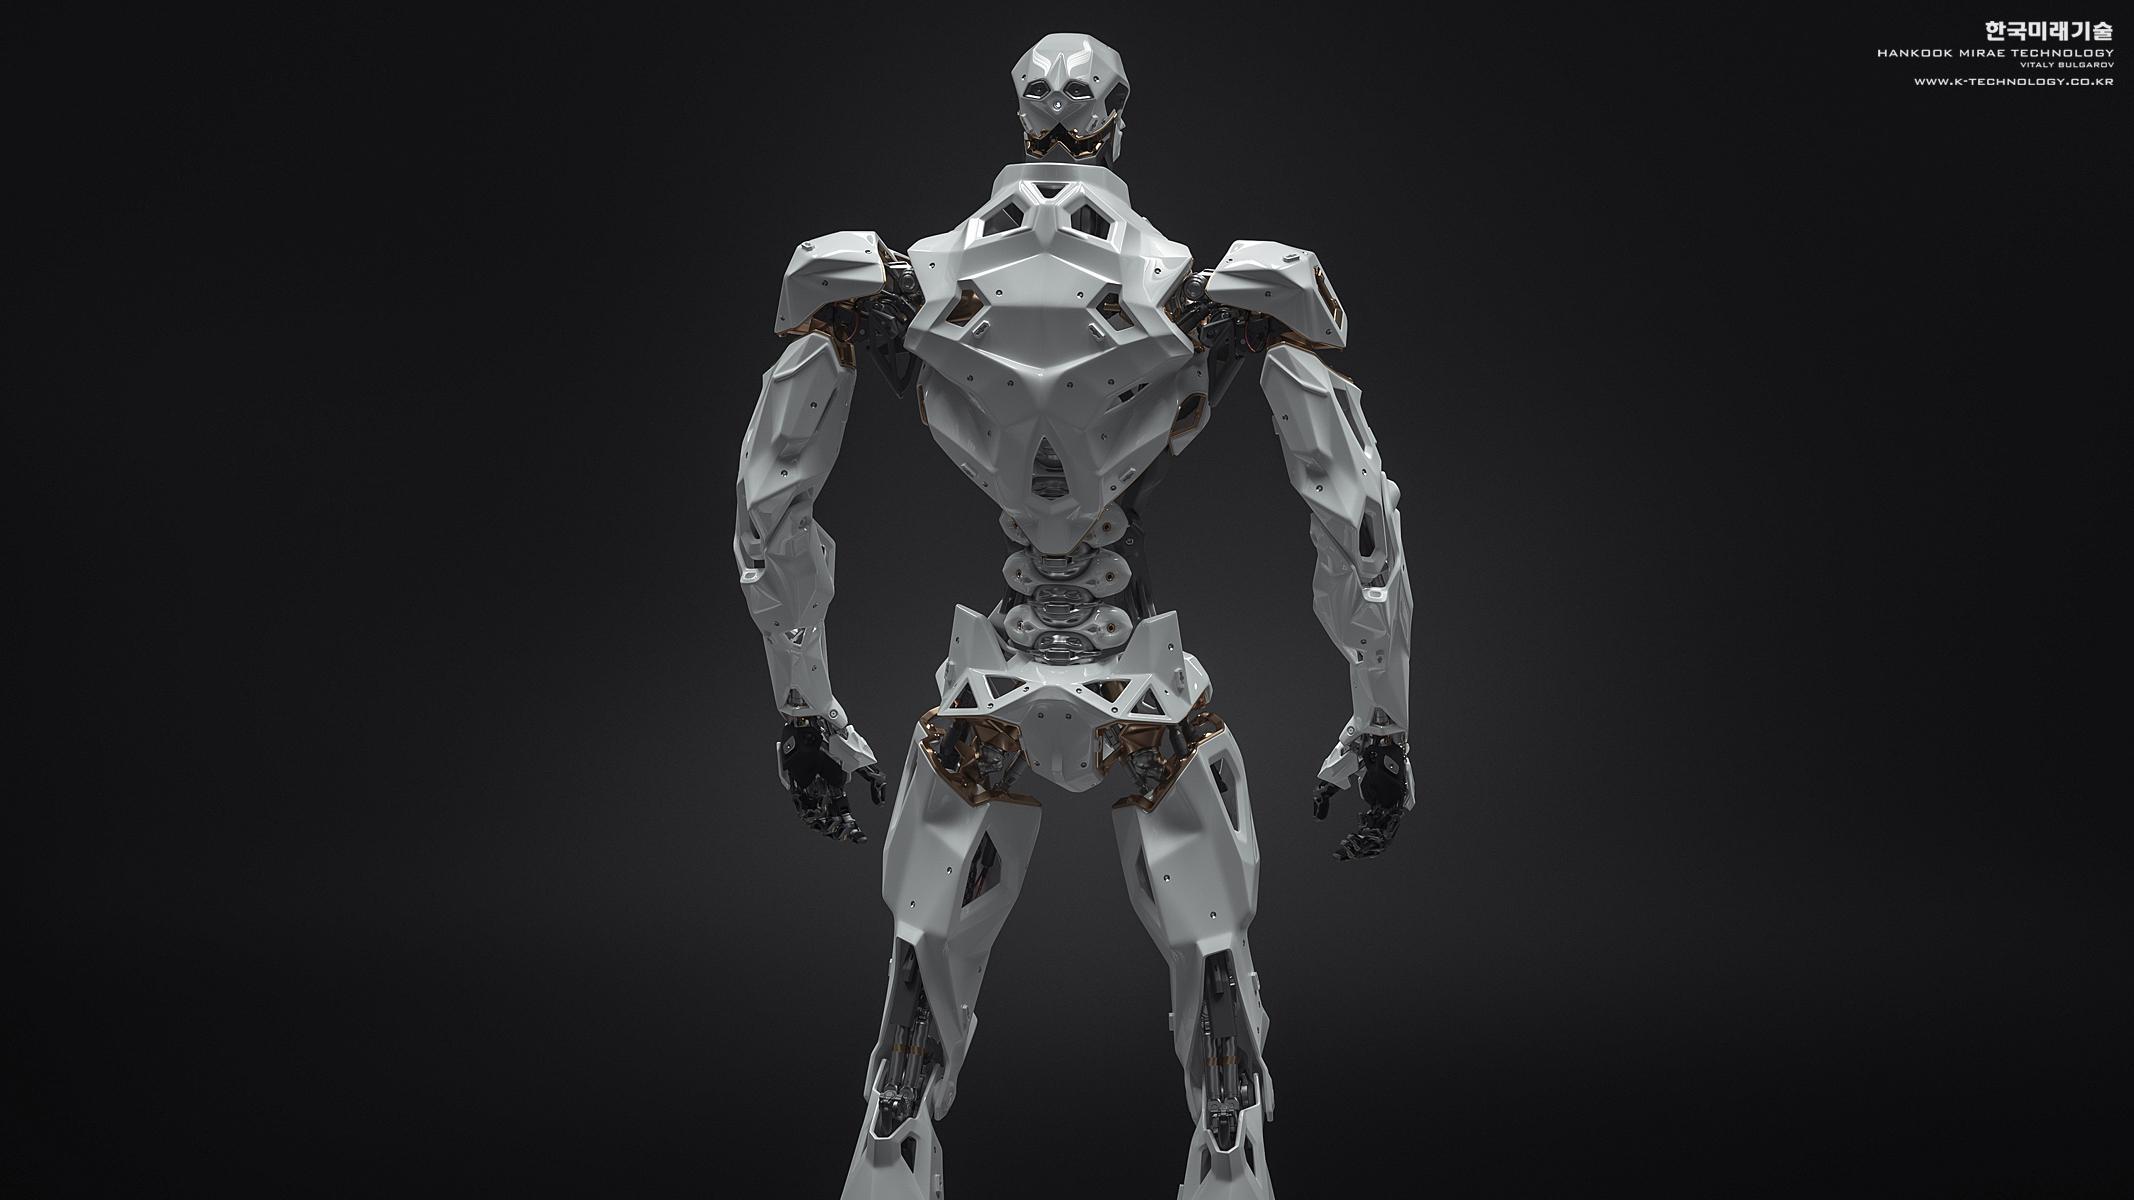 KFT_2.Xm_RobotDesign_ (14 of 29).jpg